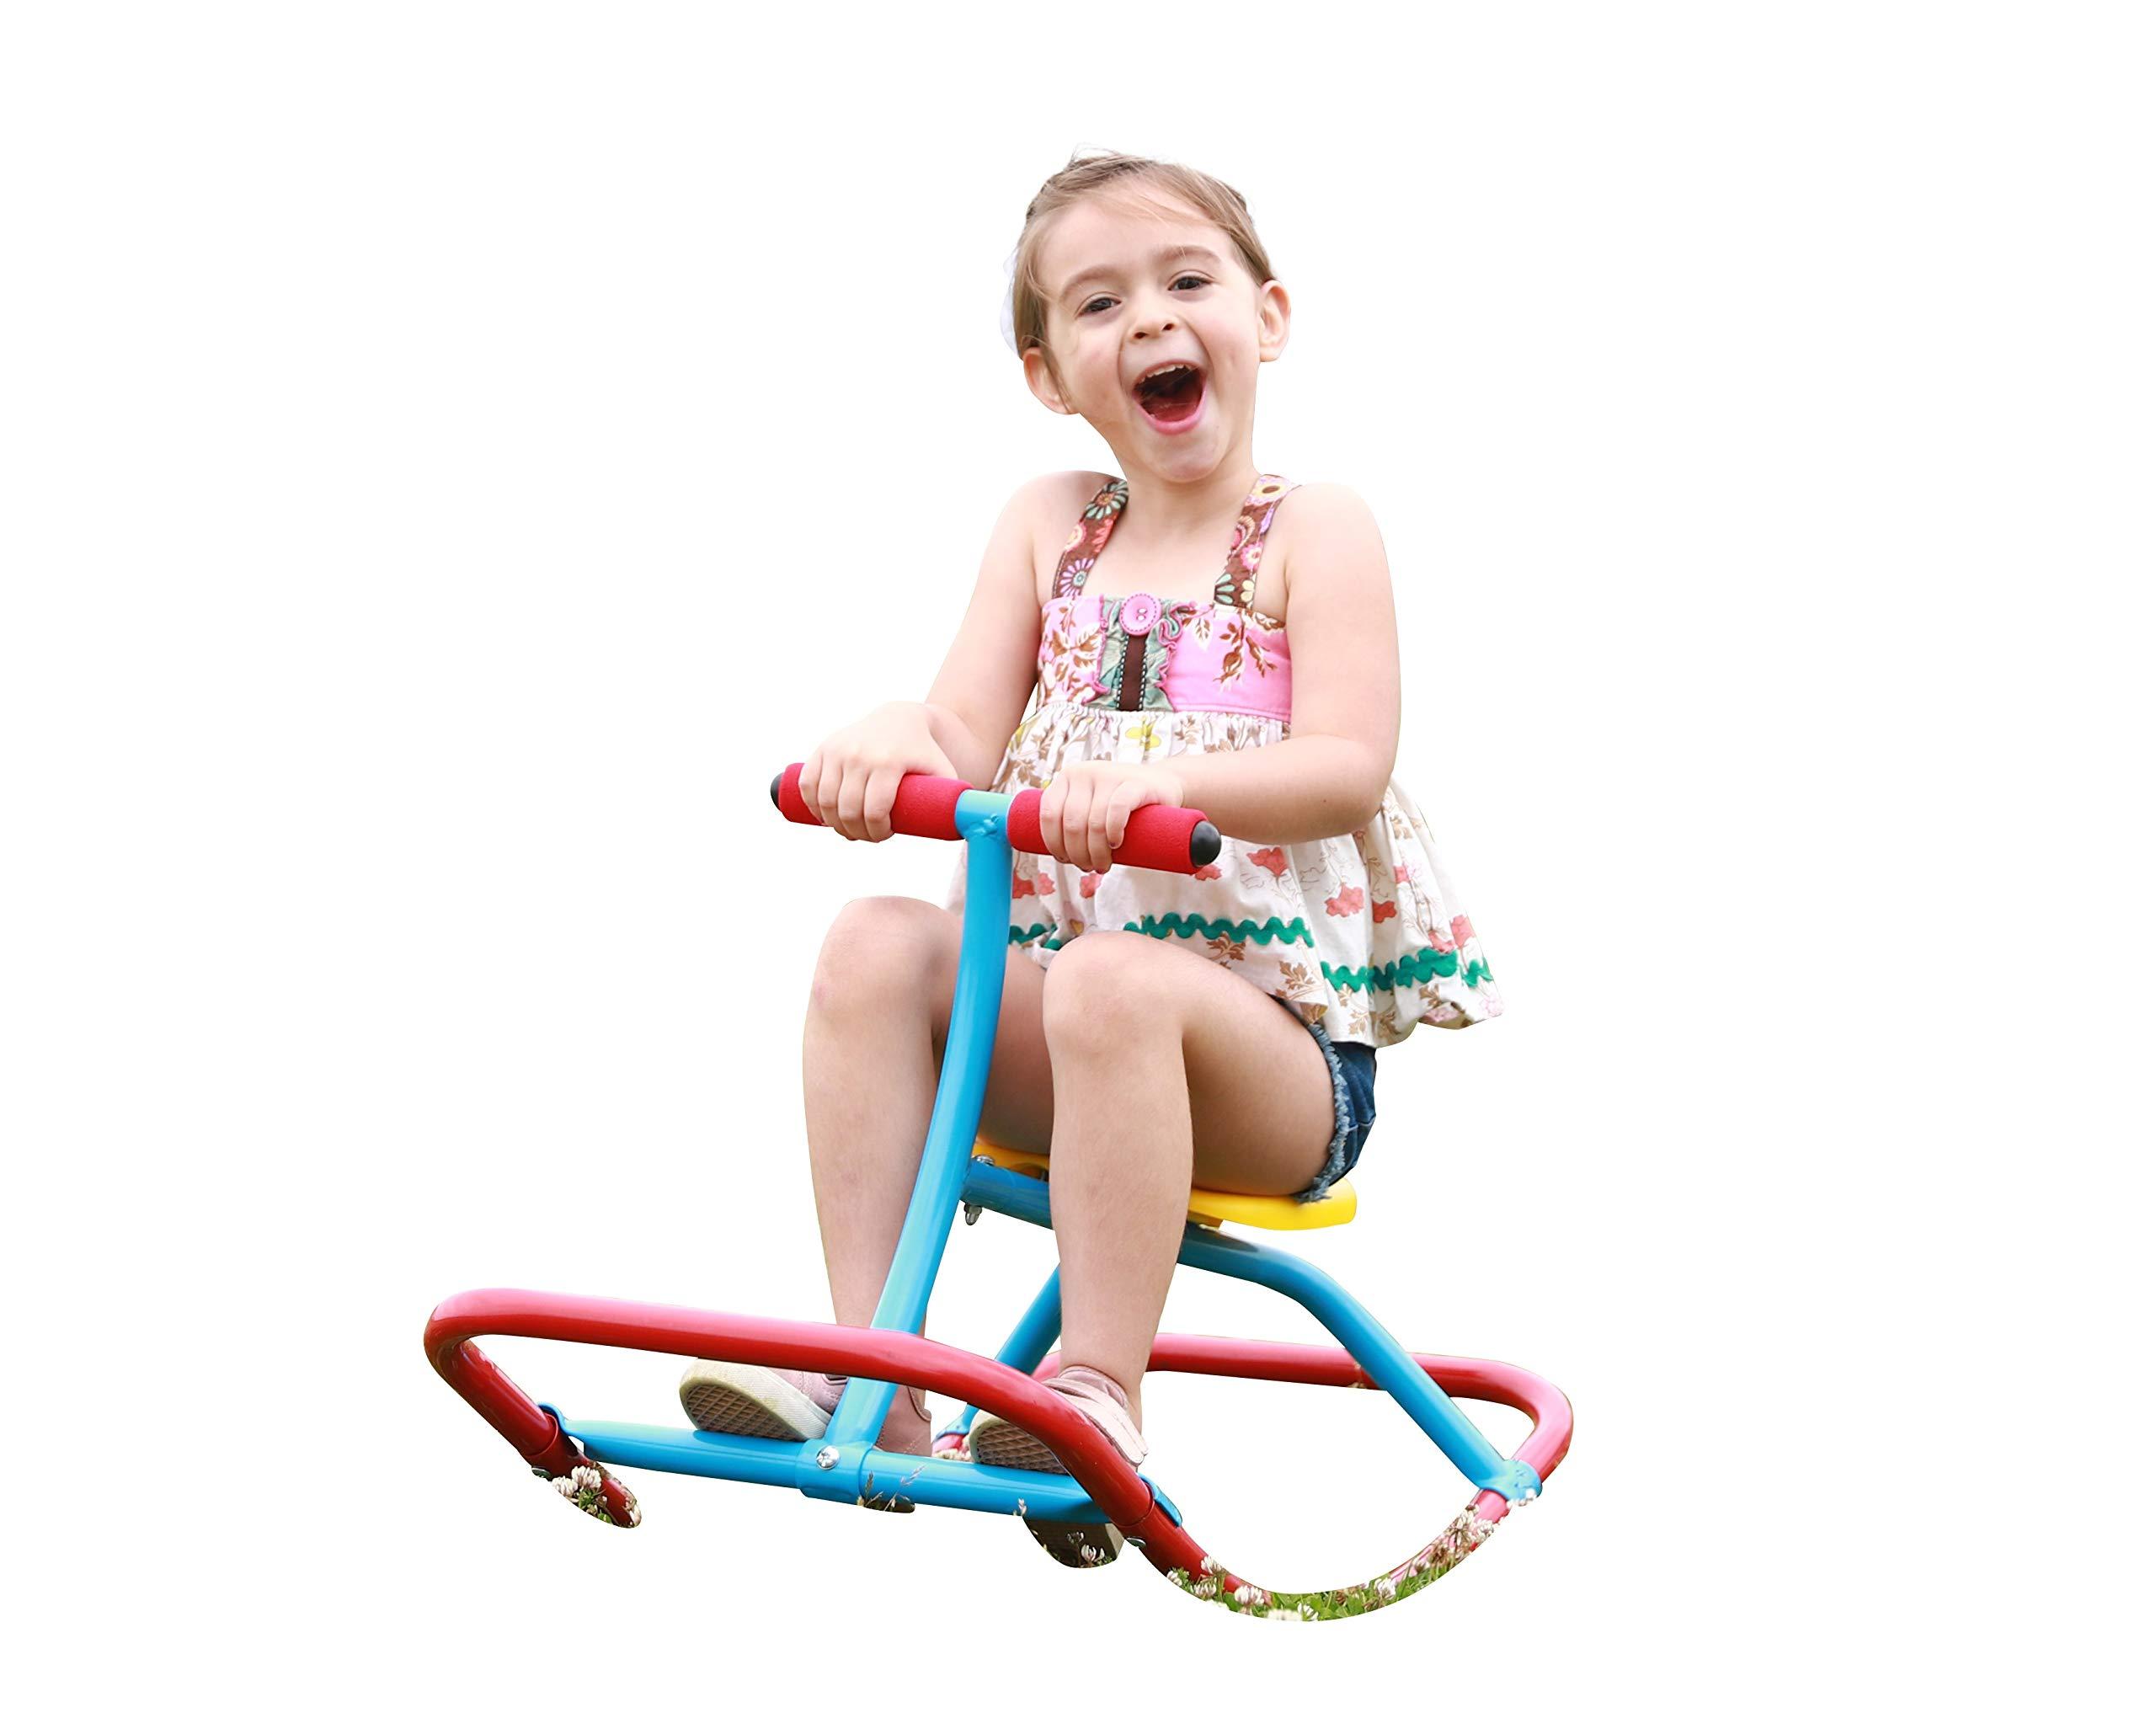 SLIDEWHIZZER Kids Rocking Chair Seesaw Rider: Safe Home Playground Backyard Equipment, Rocker Single Teeter Totter for Youth Junior Kids. (Kid First Seesaw) by SLIDEWHIZZER